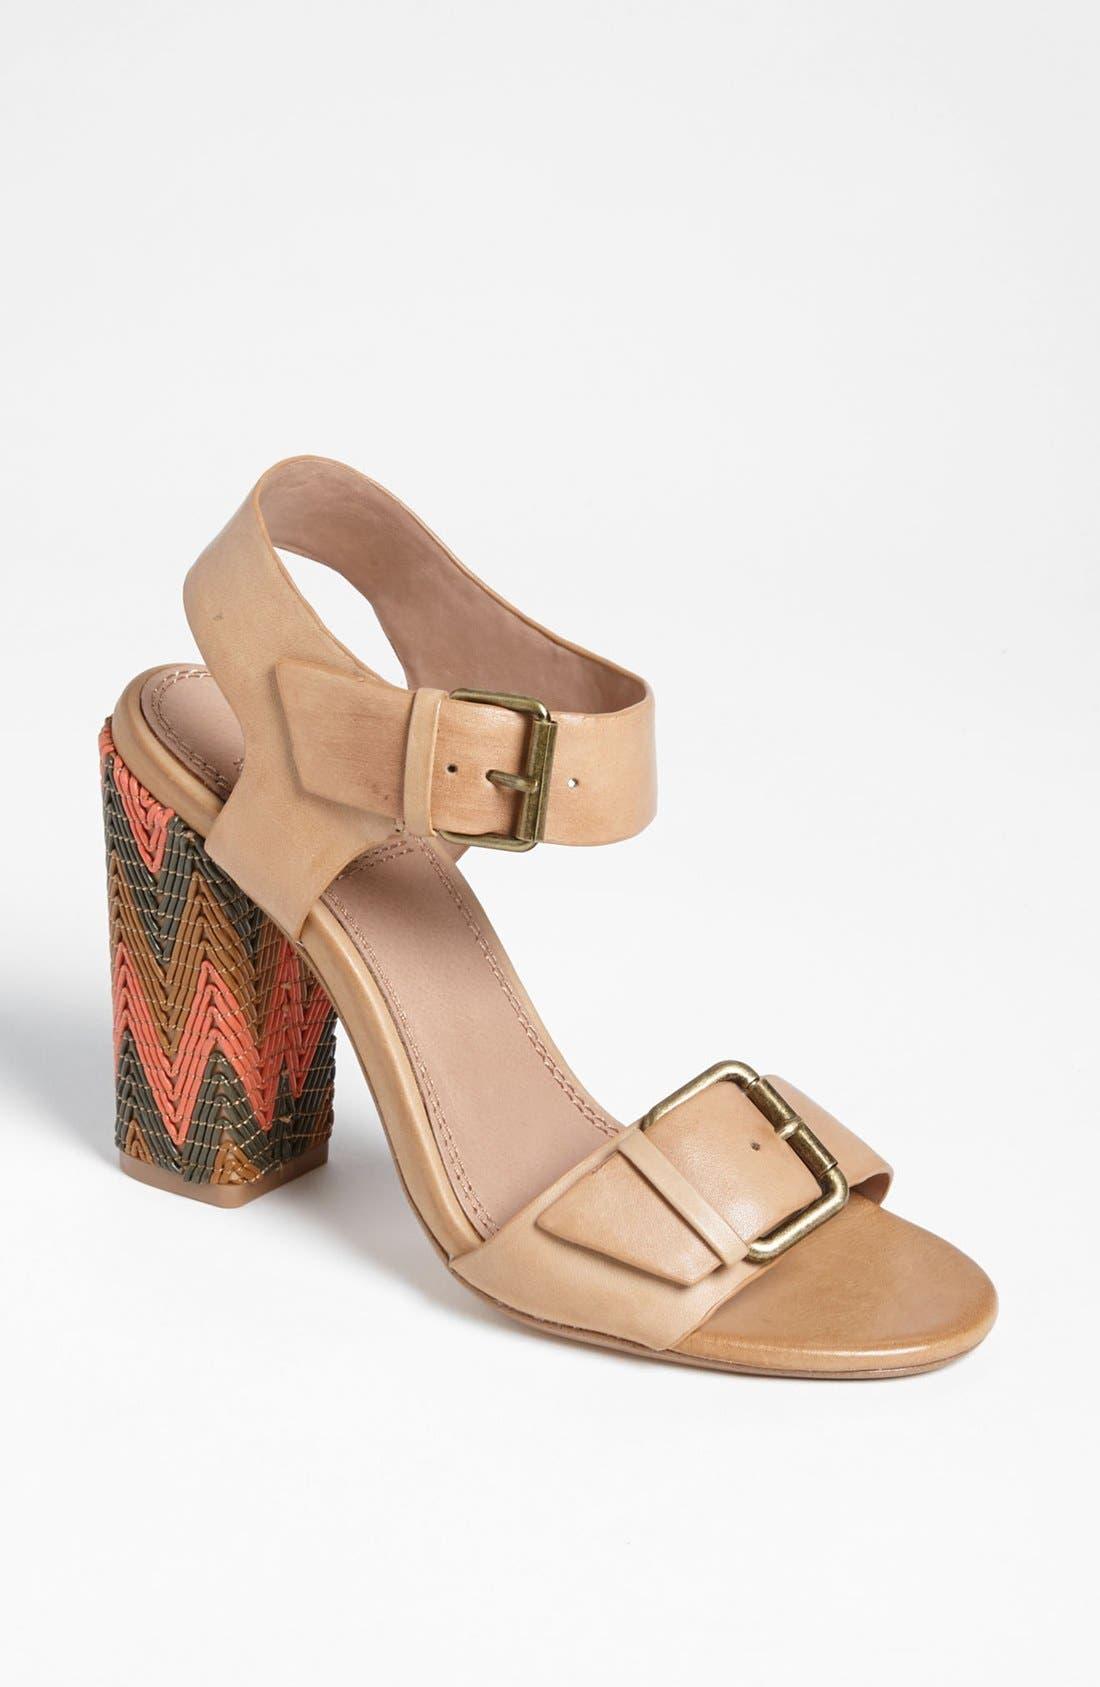 Alternate Image 1 Selected - Ella Moss 'Tessa' Sandal